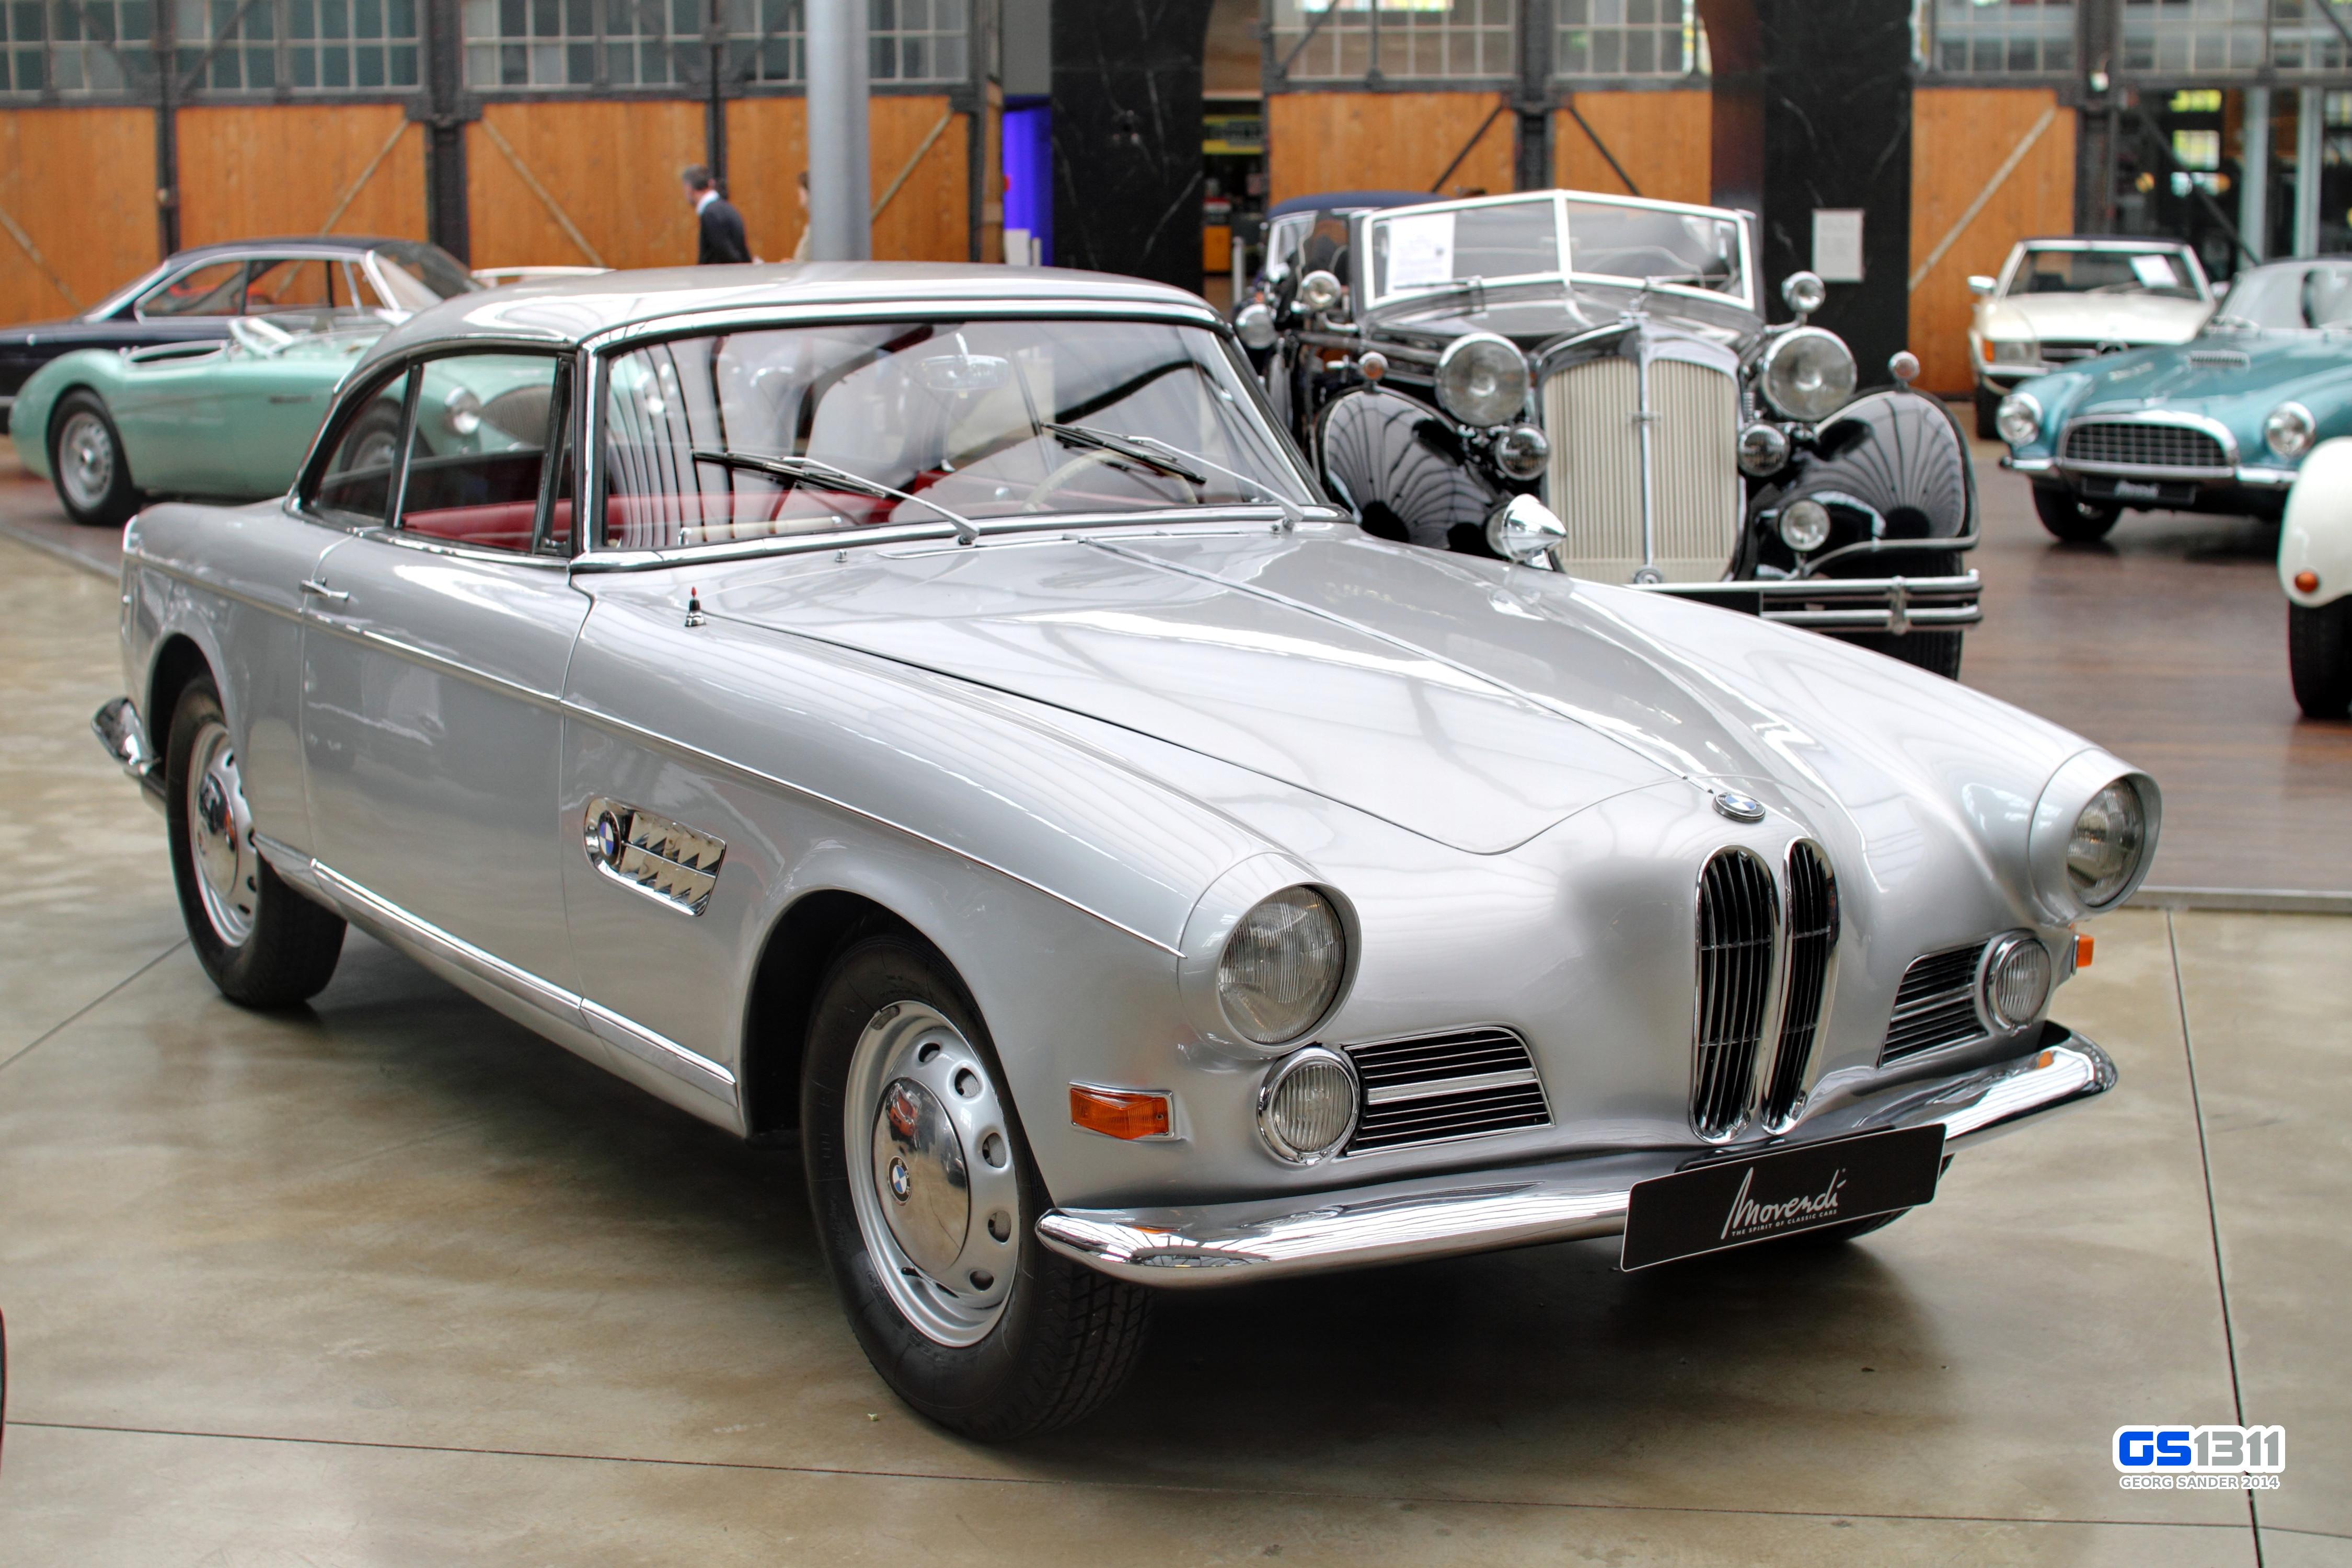 Wallpaper : old, BMW, sports car, Vintage car, silver, classic car ...